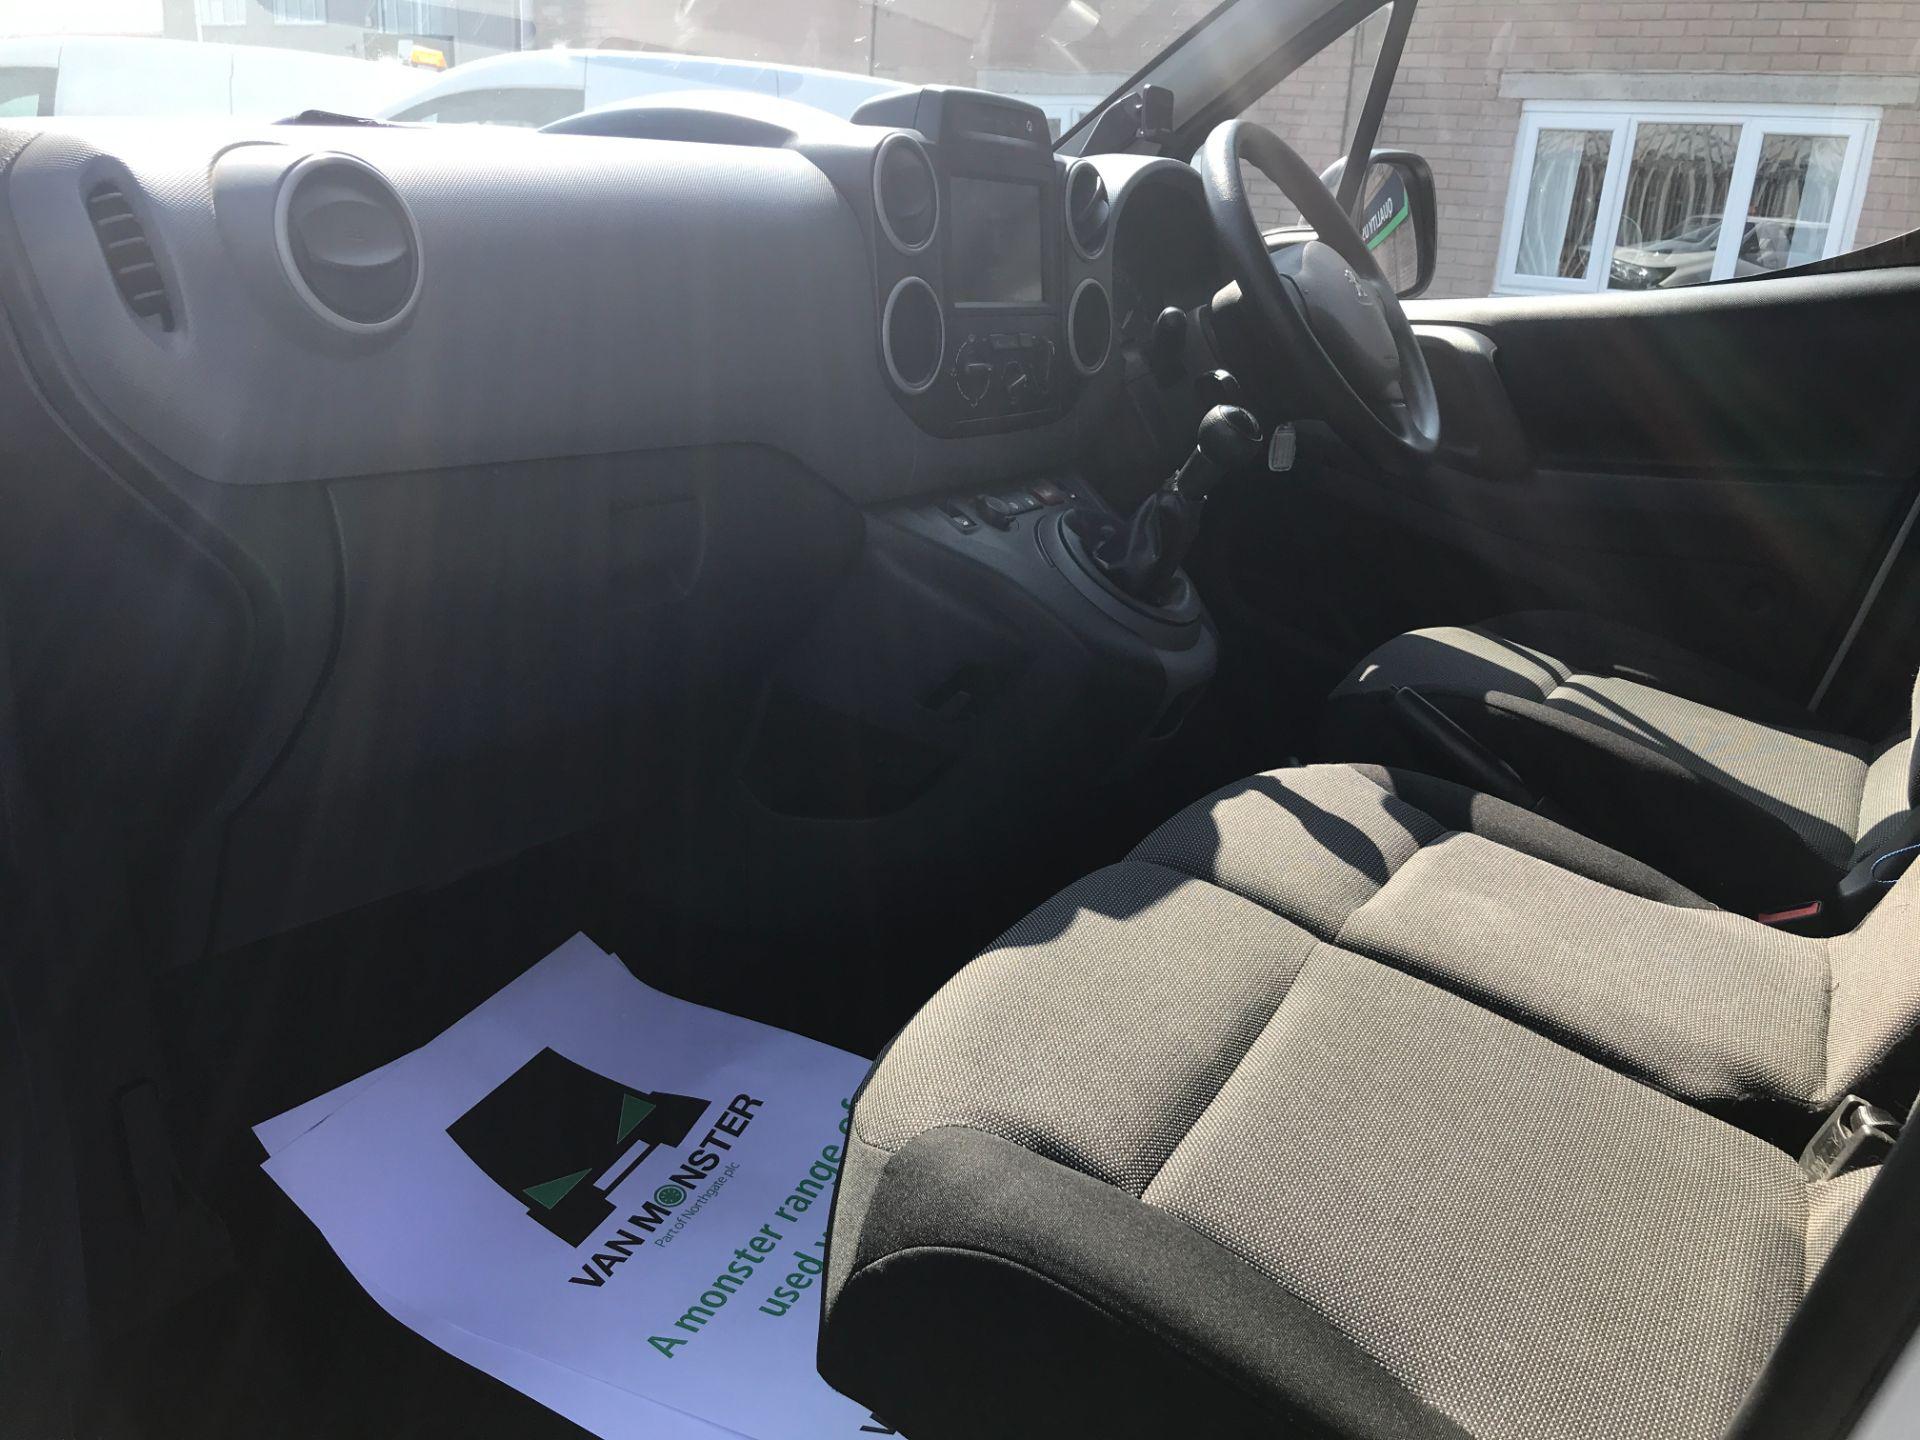 2017 Peugeot Partner L1 850 1.6BLUEHDI 100PS PROFESSIONAL EURO 6 (NU17BFP) Image 18